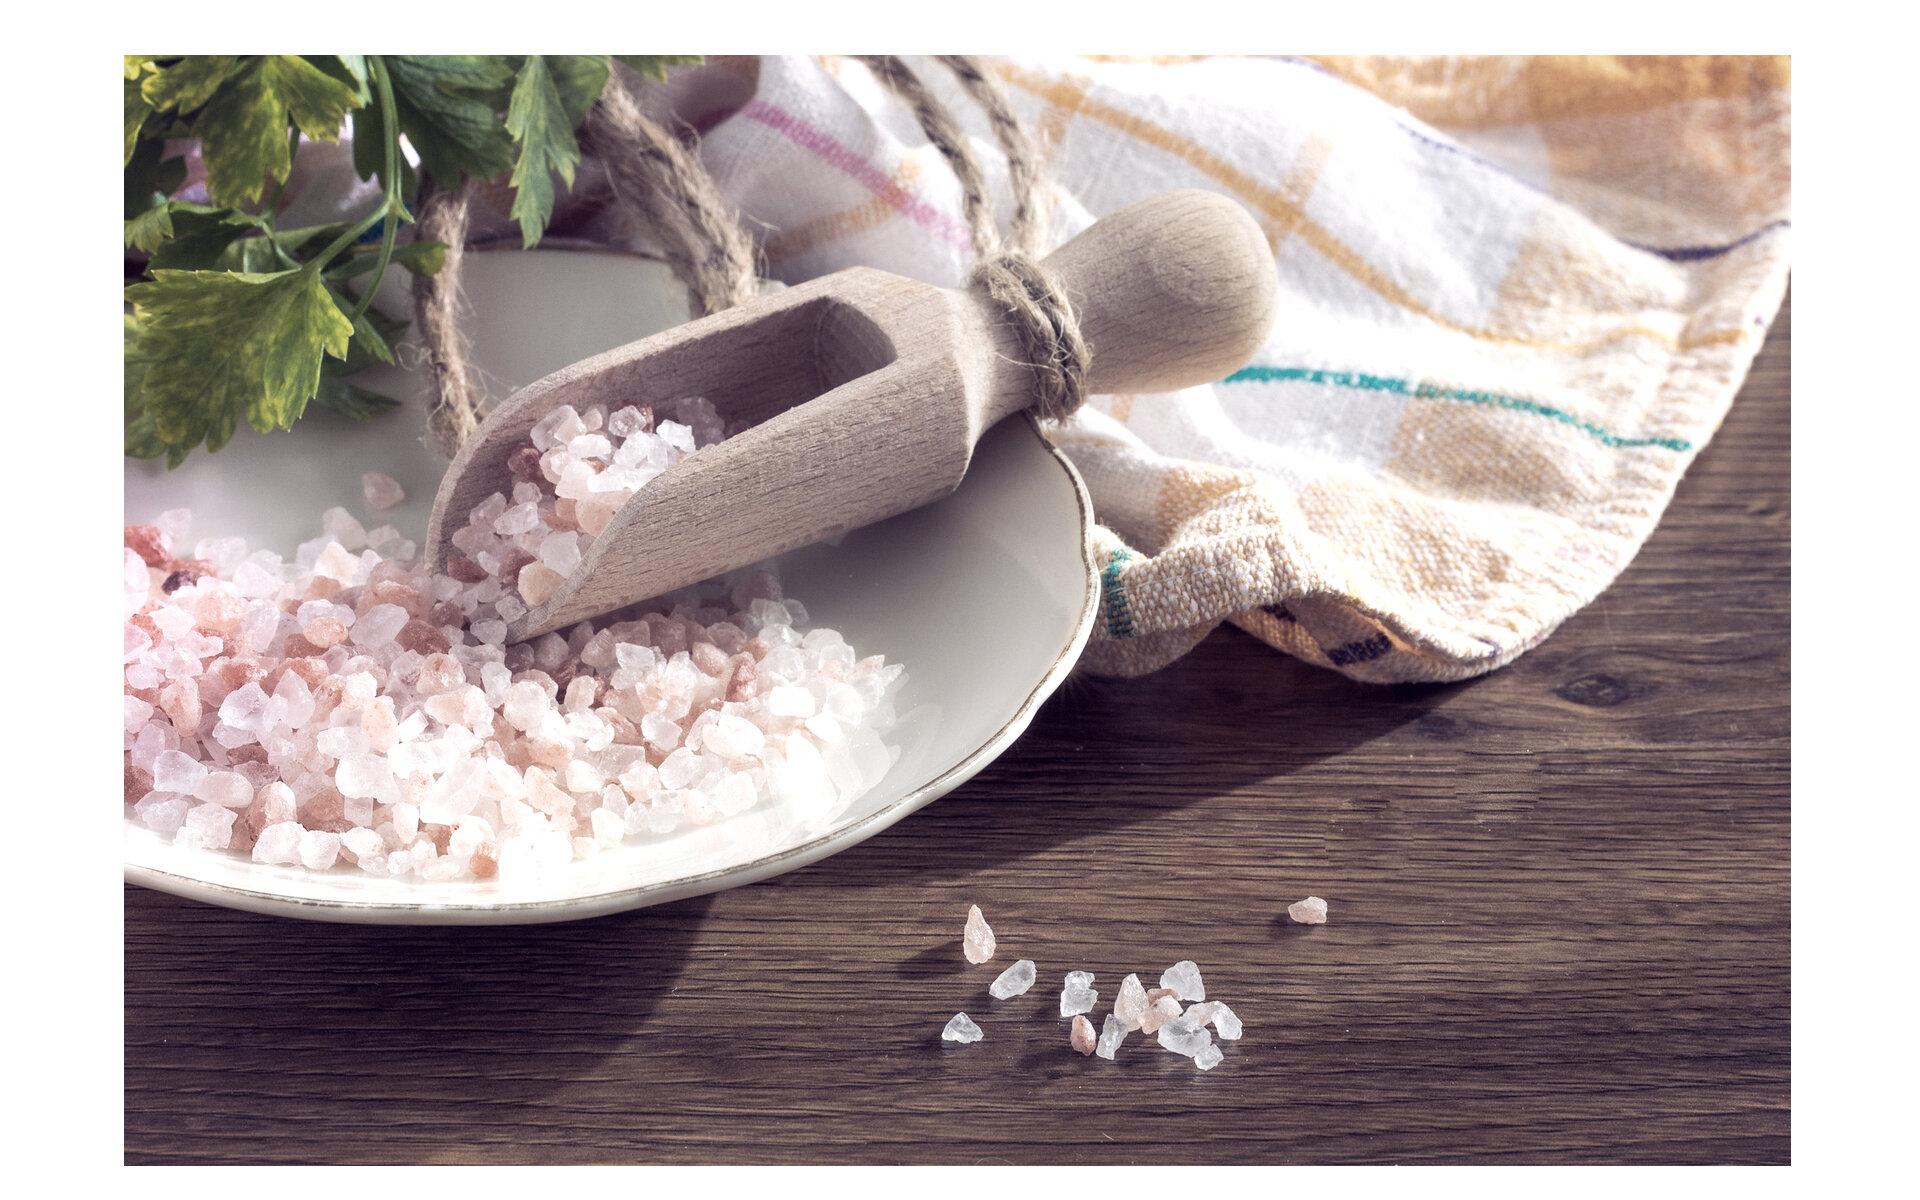 Carnation Filter Salt pink timber table and scoop.jpg